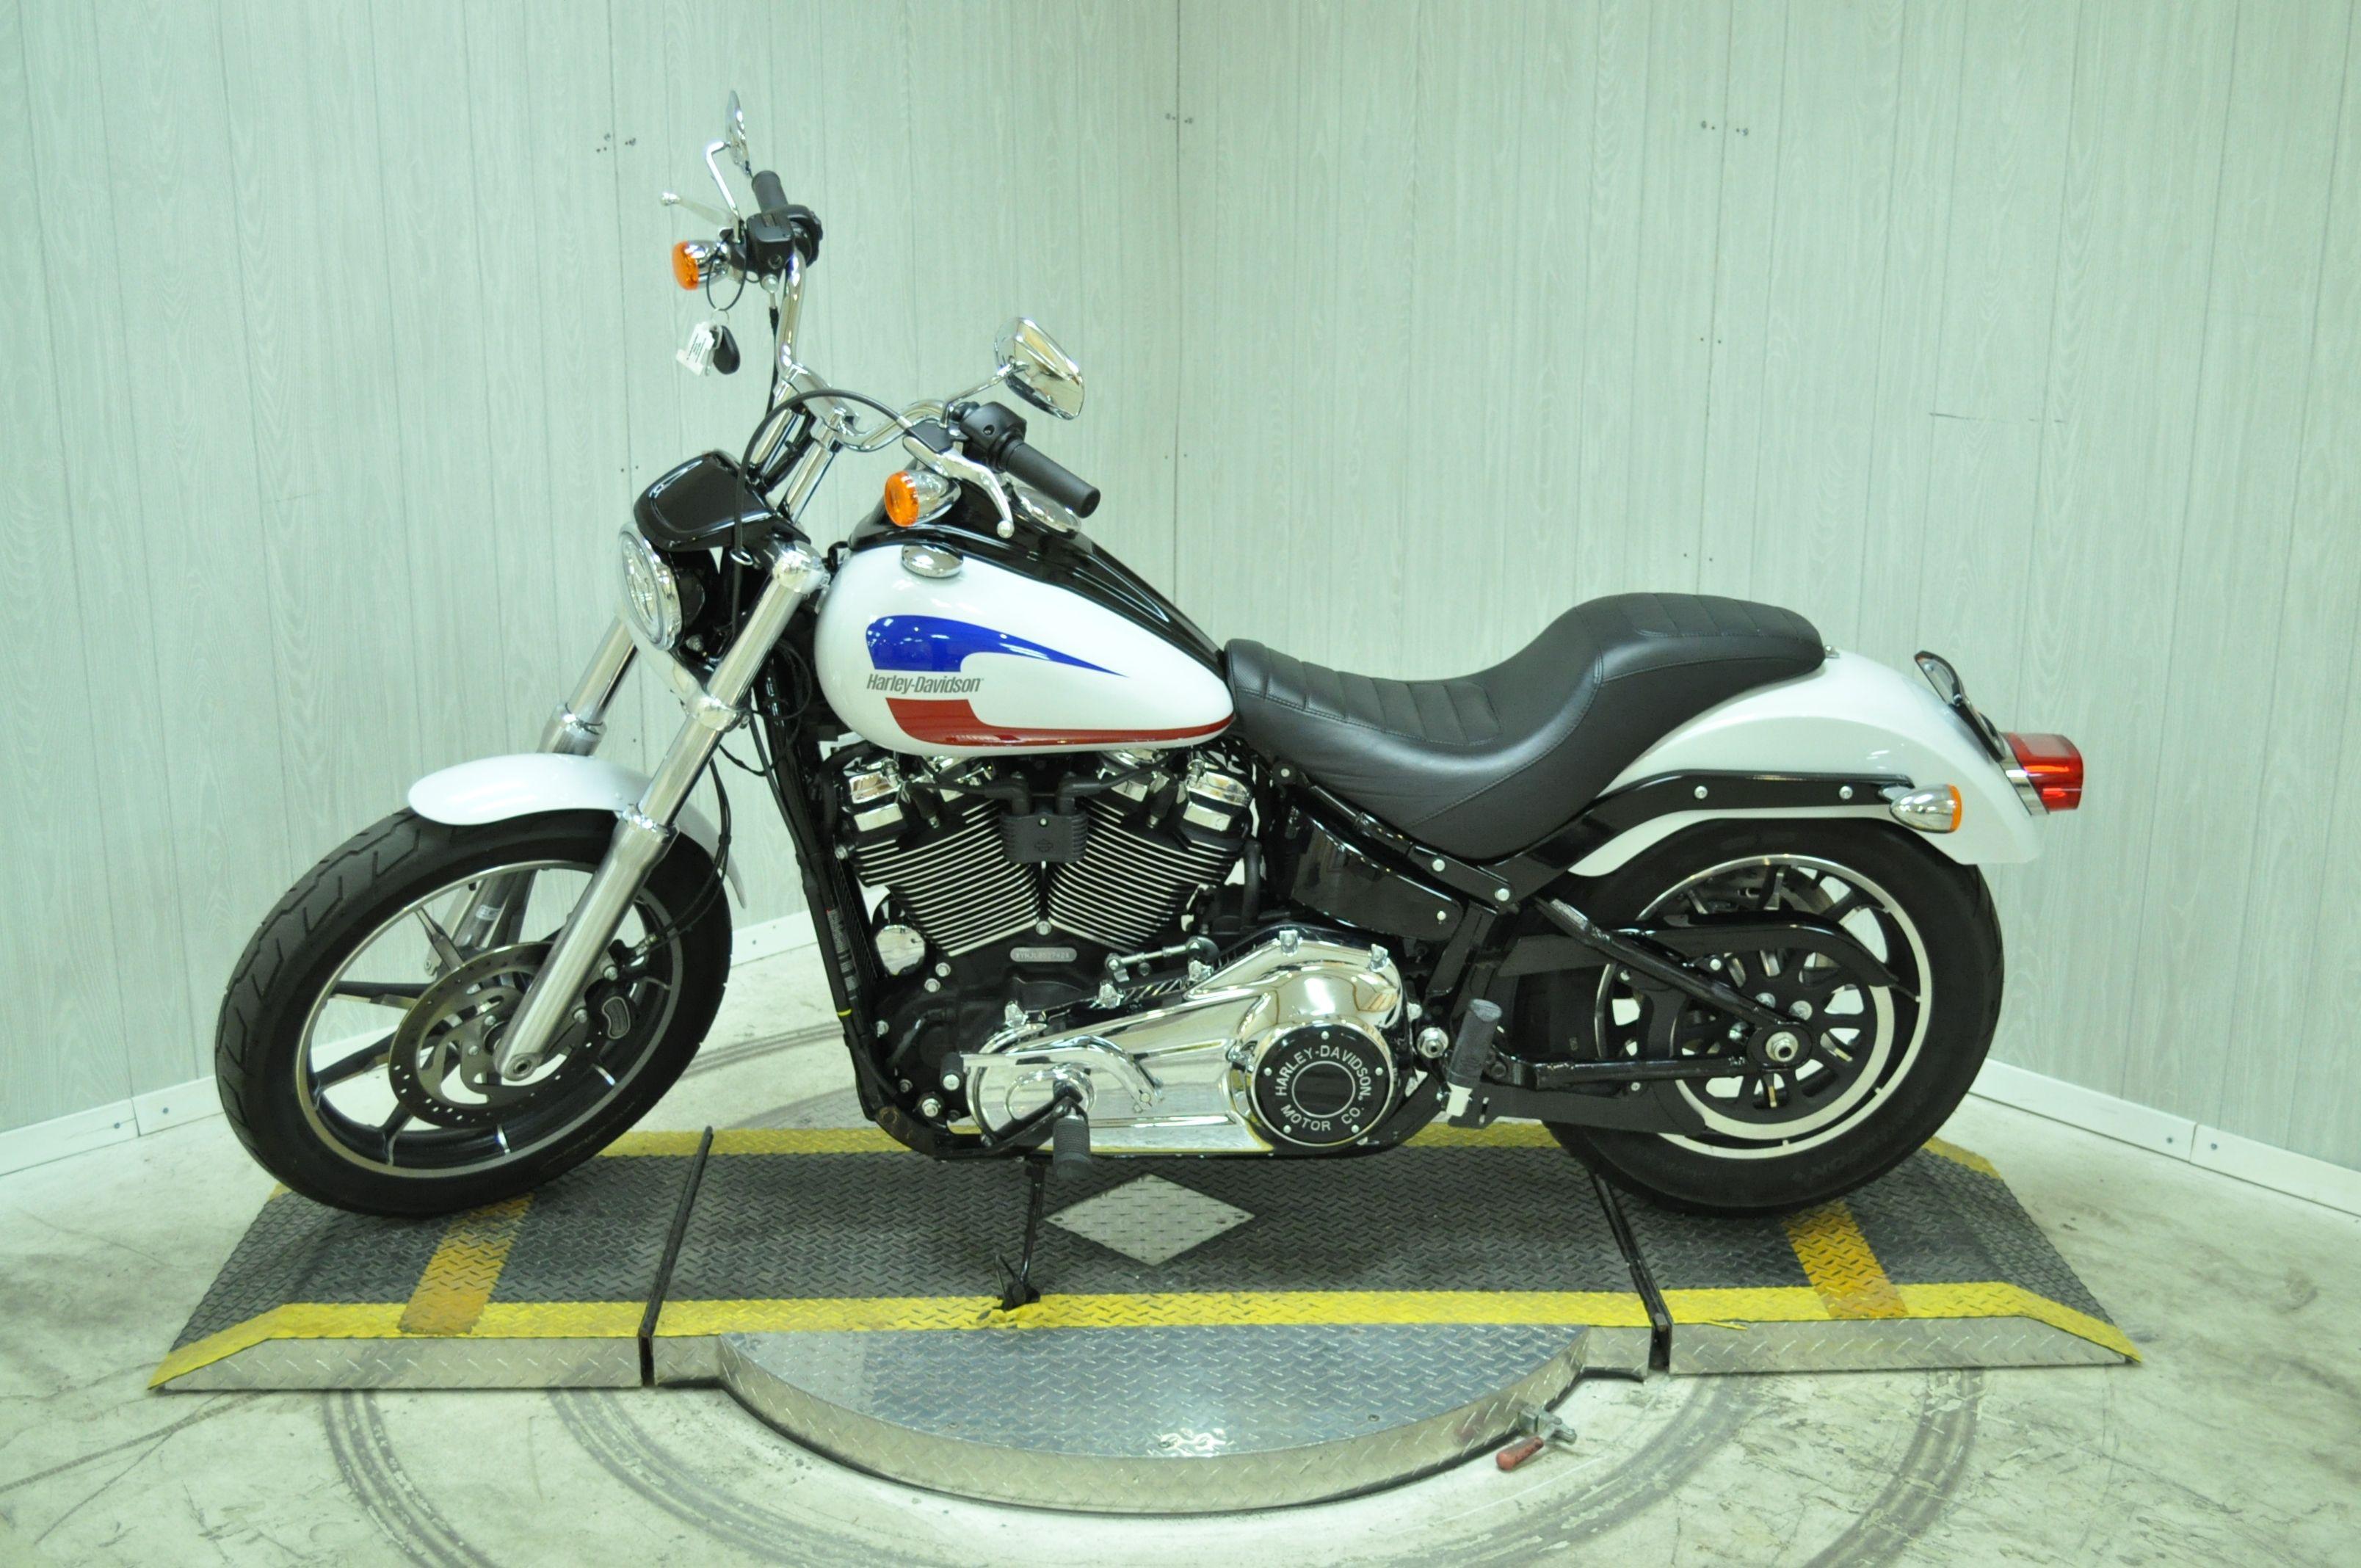 Pre-Owned 2020 Harley-Davidson Low Rider FXLR